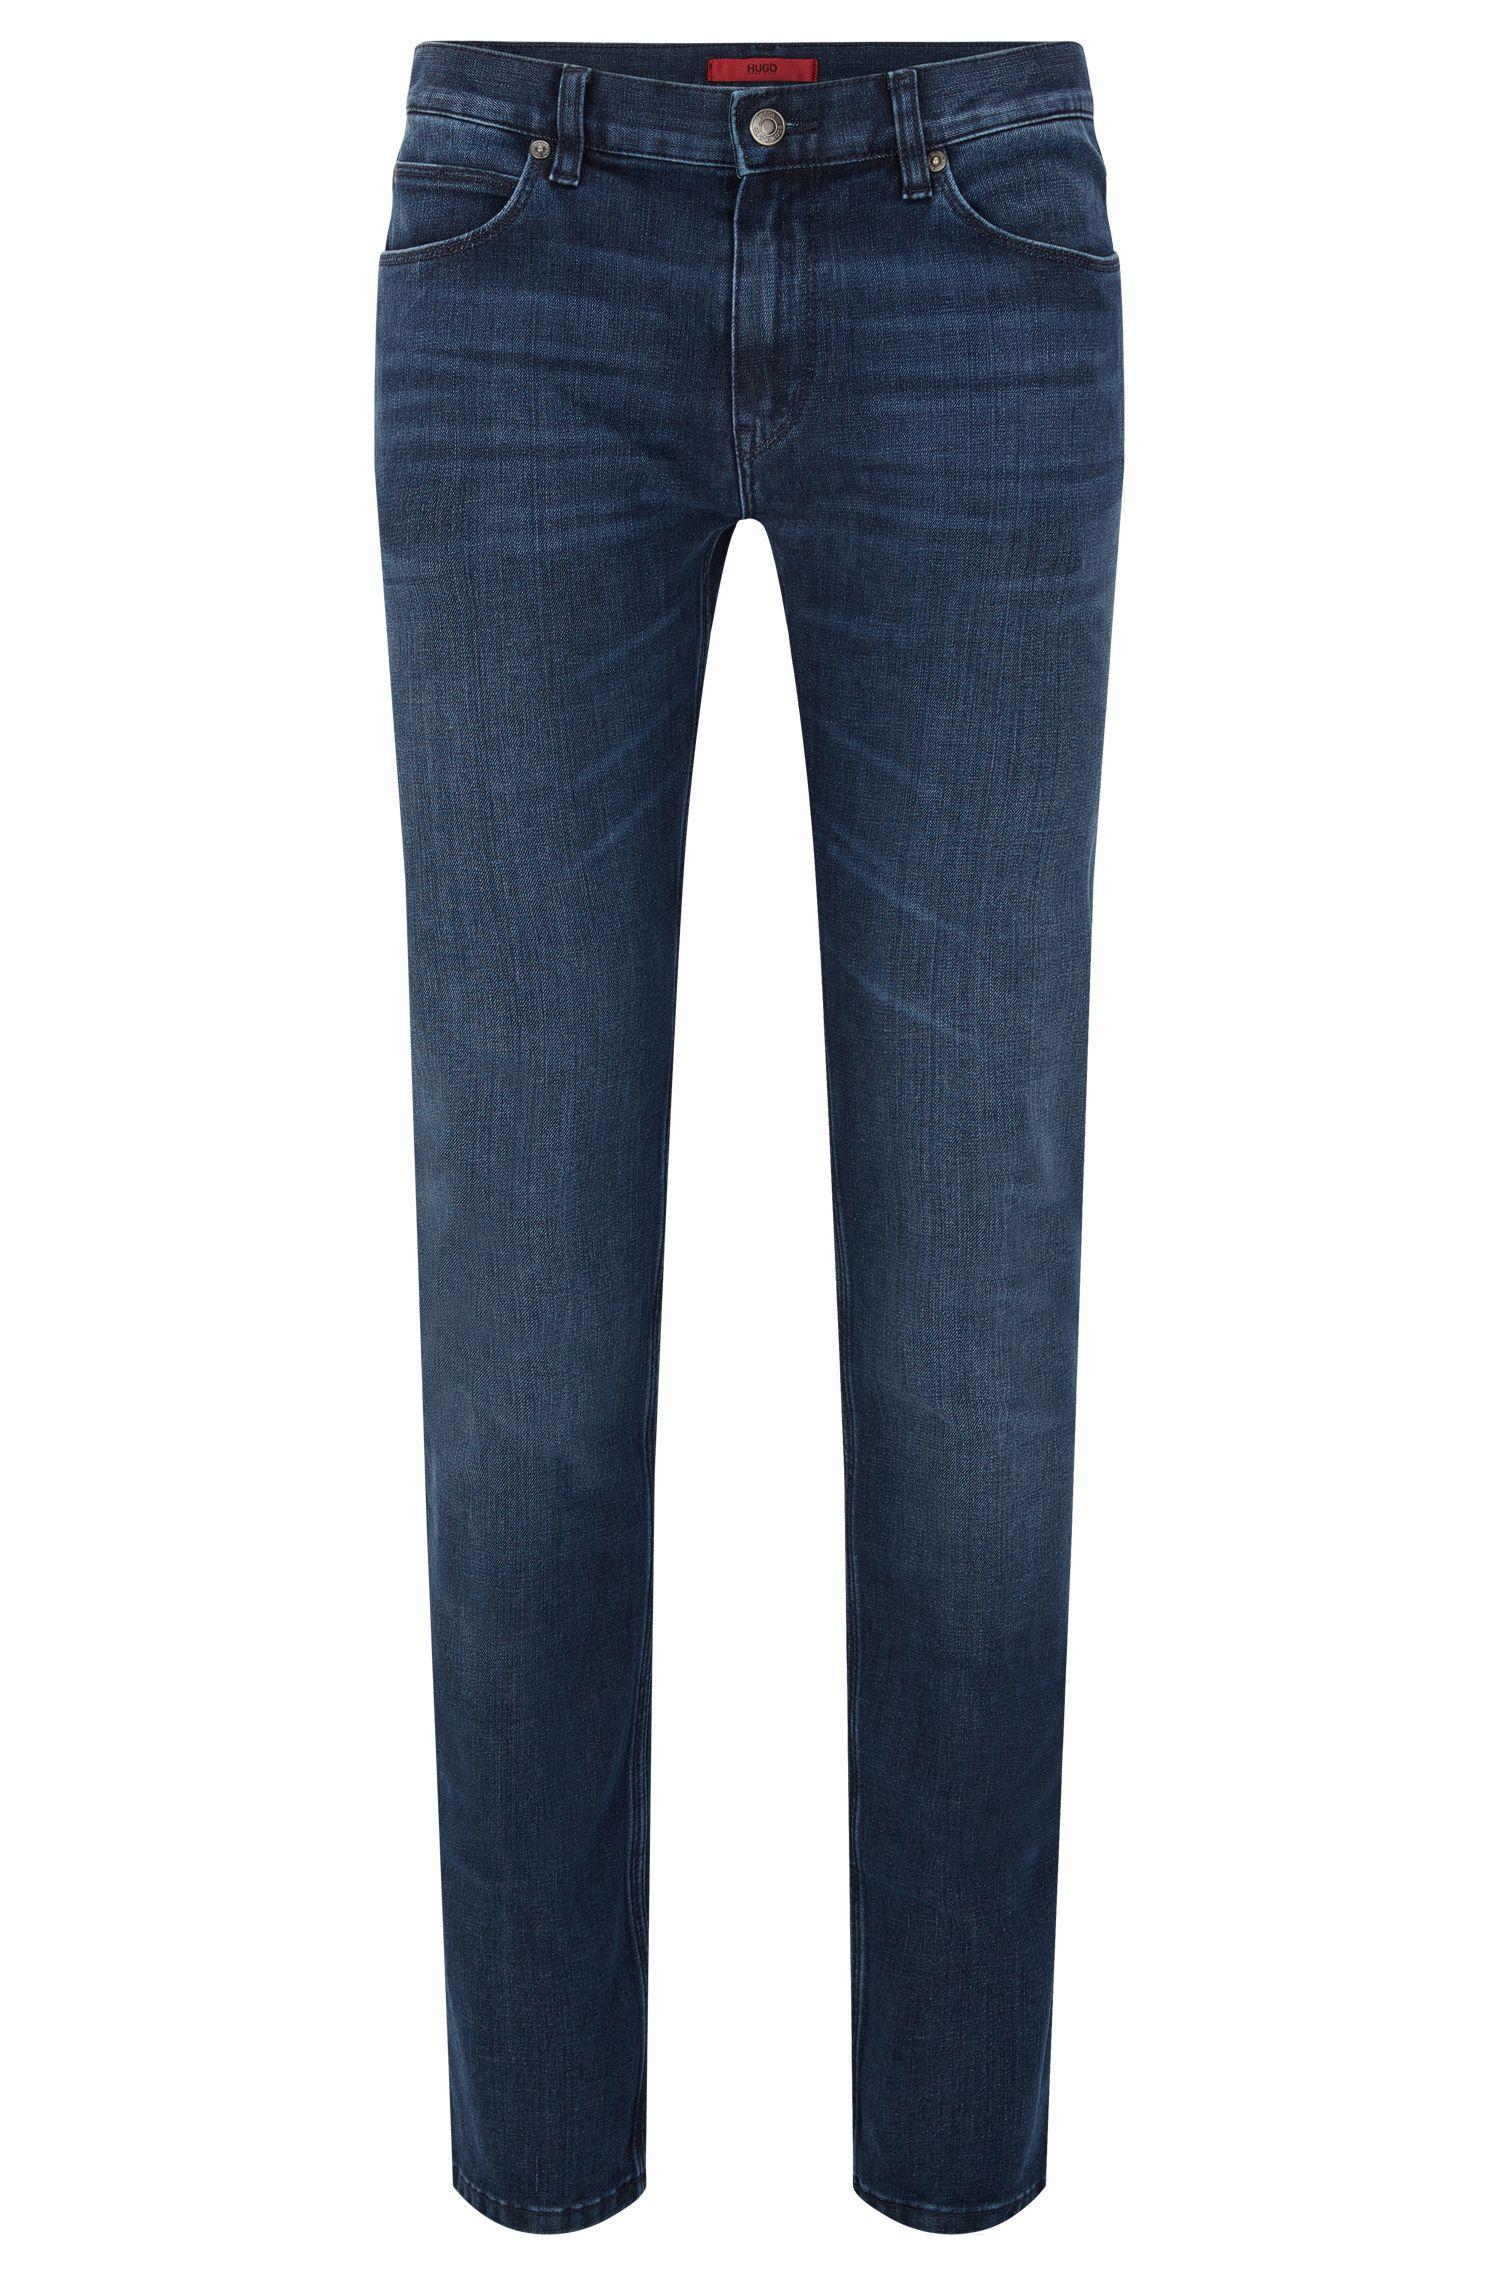 'HUGO 708' | Slim Fit, 12 oz Stretch Cotton Blend Jeans